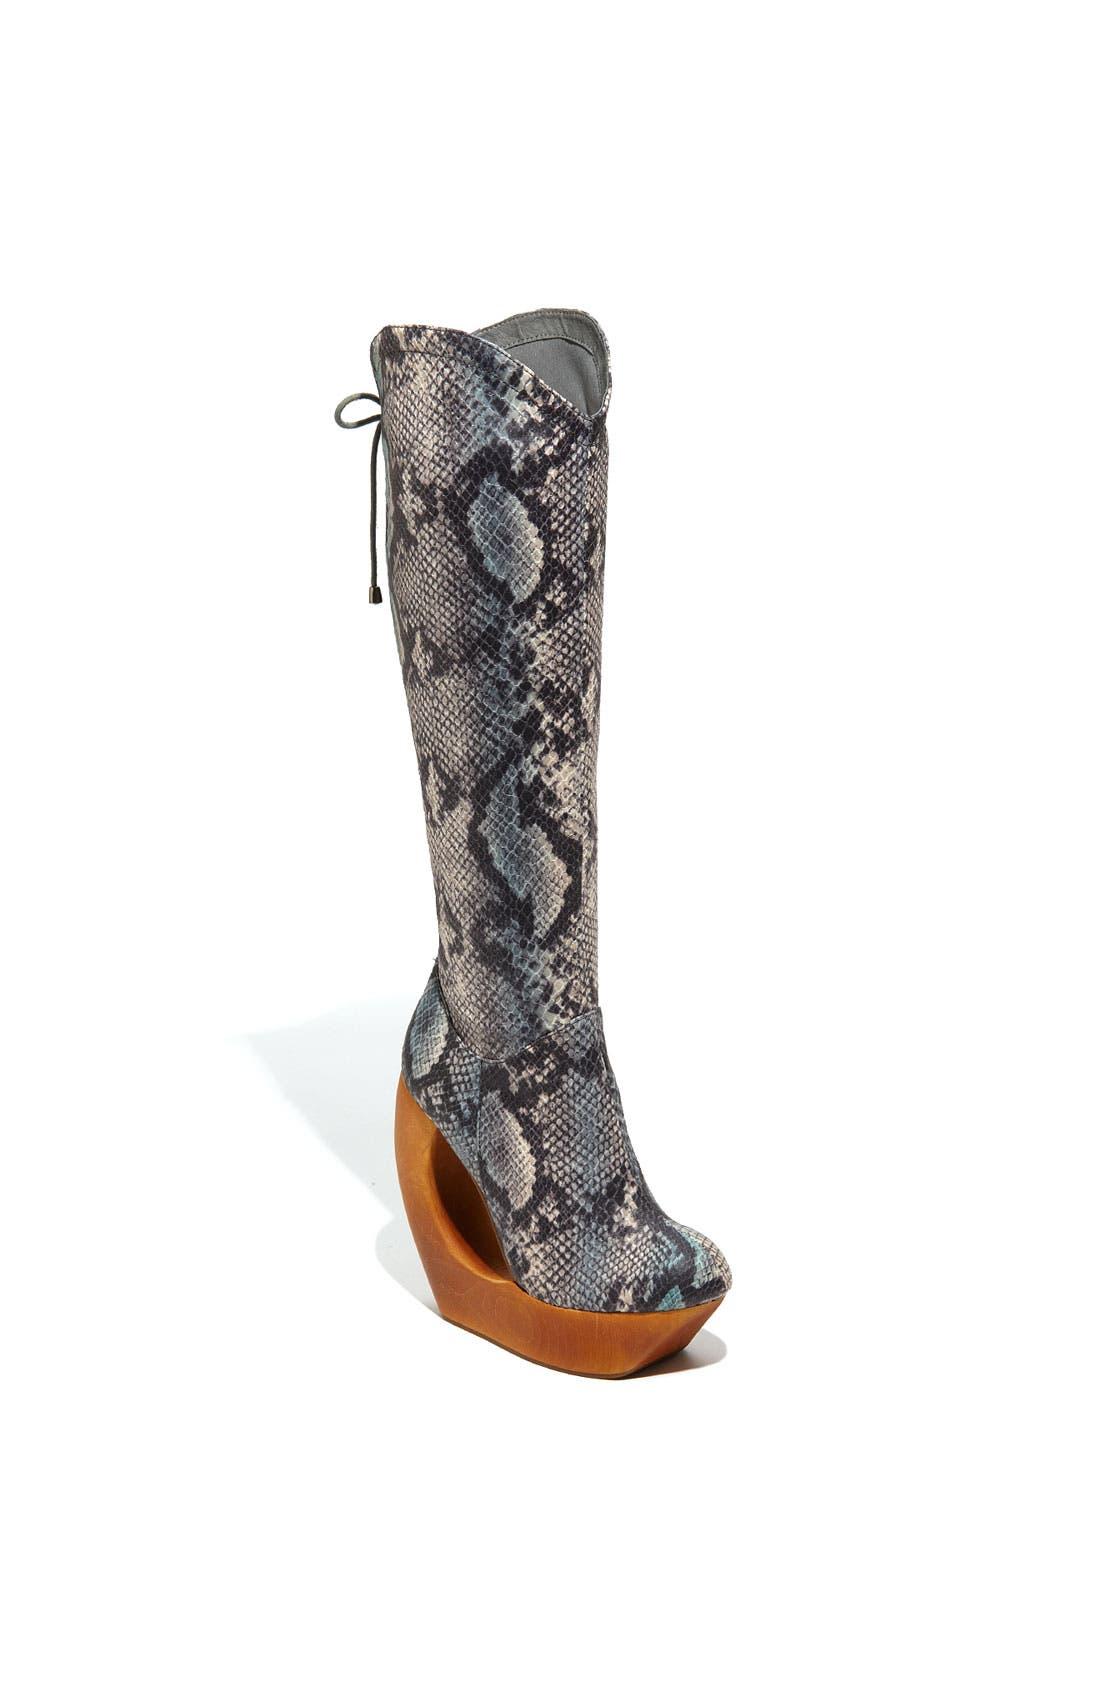 Alternate Image 1 Selected - Jeffrey Campbell 'Rockferry' Boot